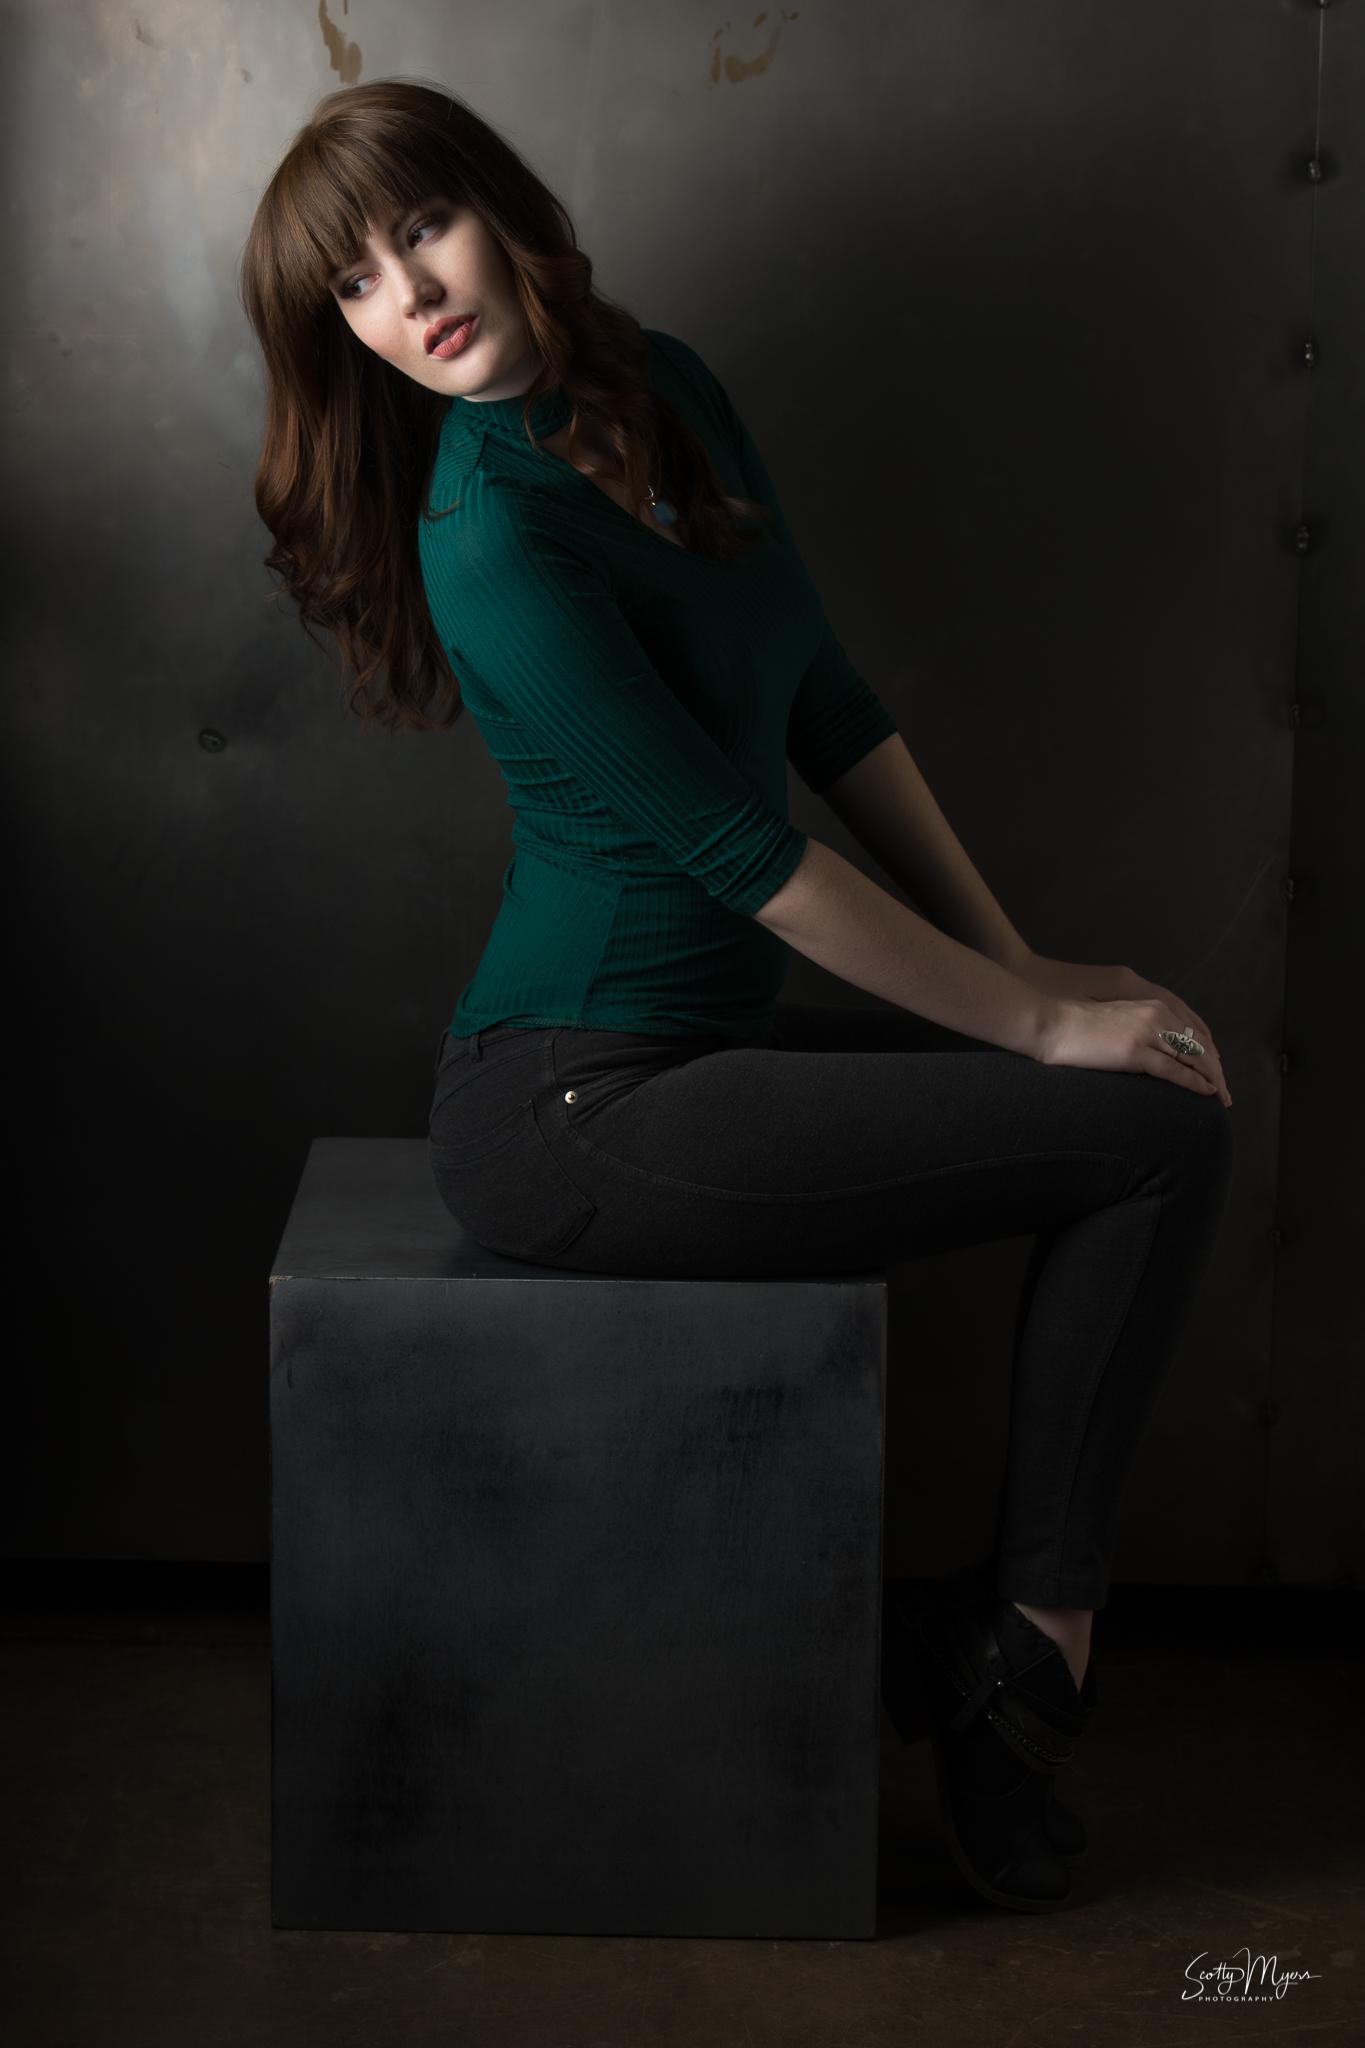 Christiana-9